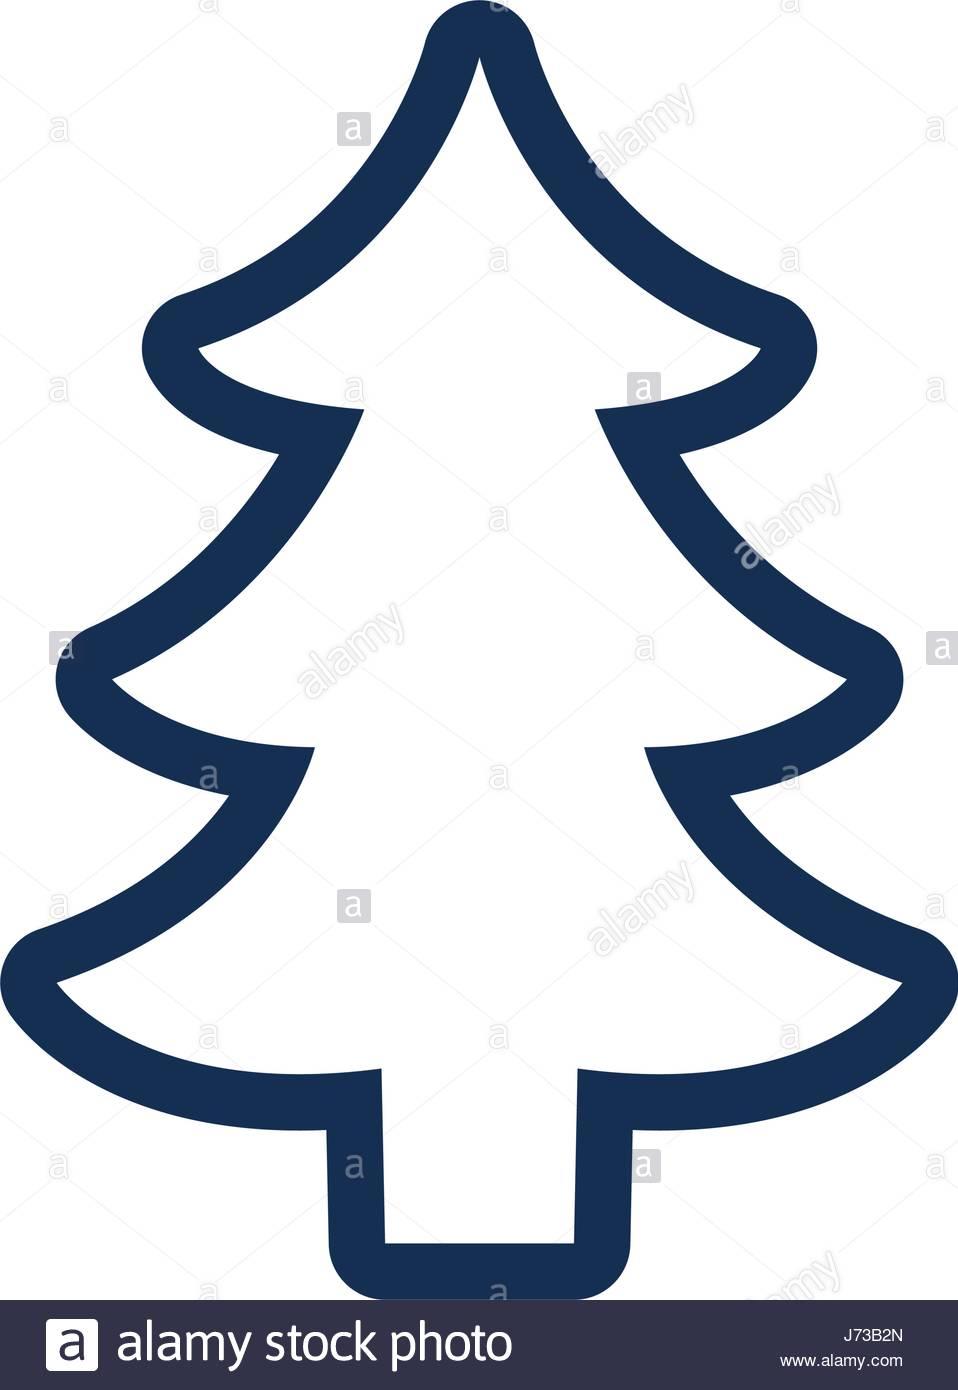 958x1390 Silhouette Tree Pine Christmas Decoration Stock Vector Art